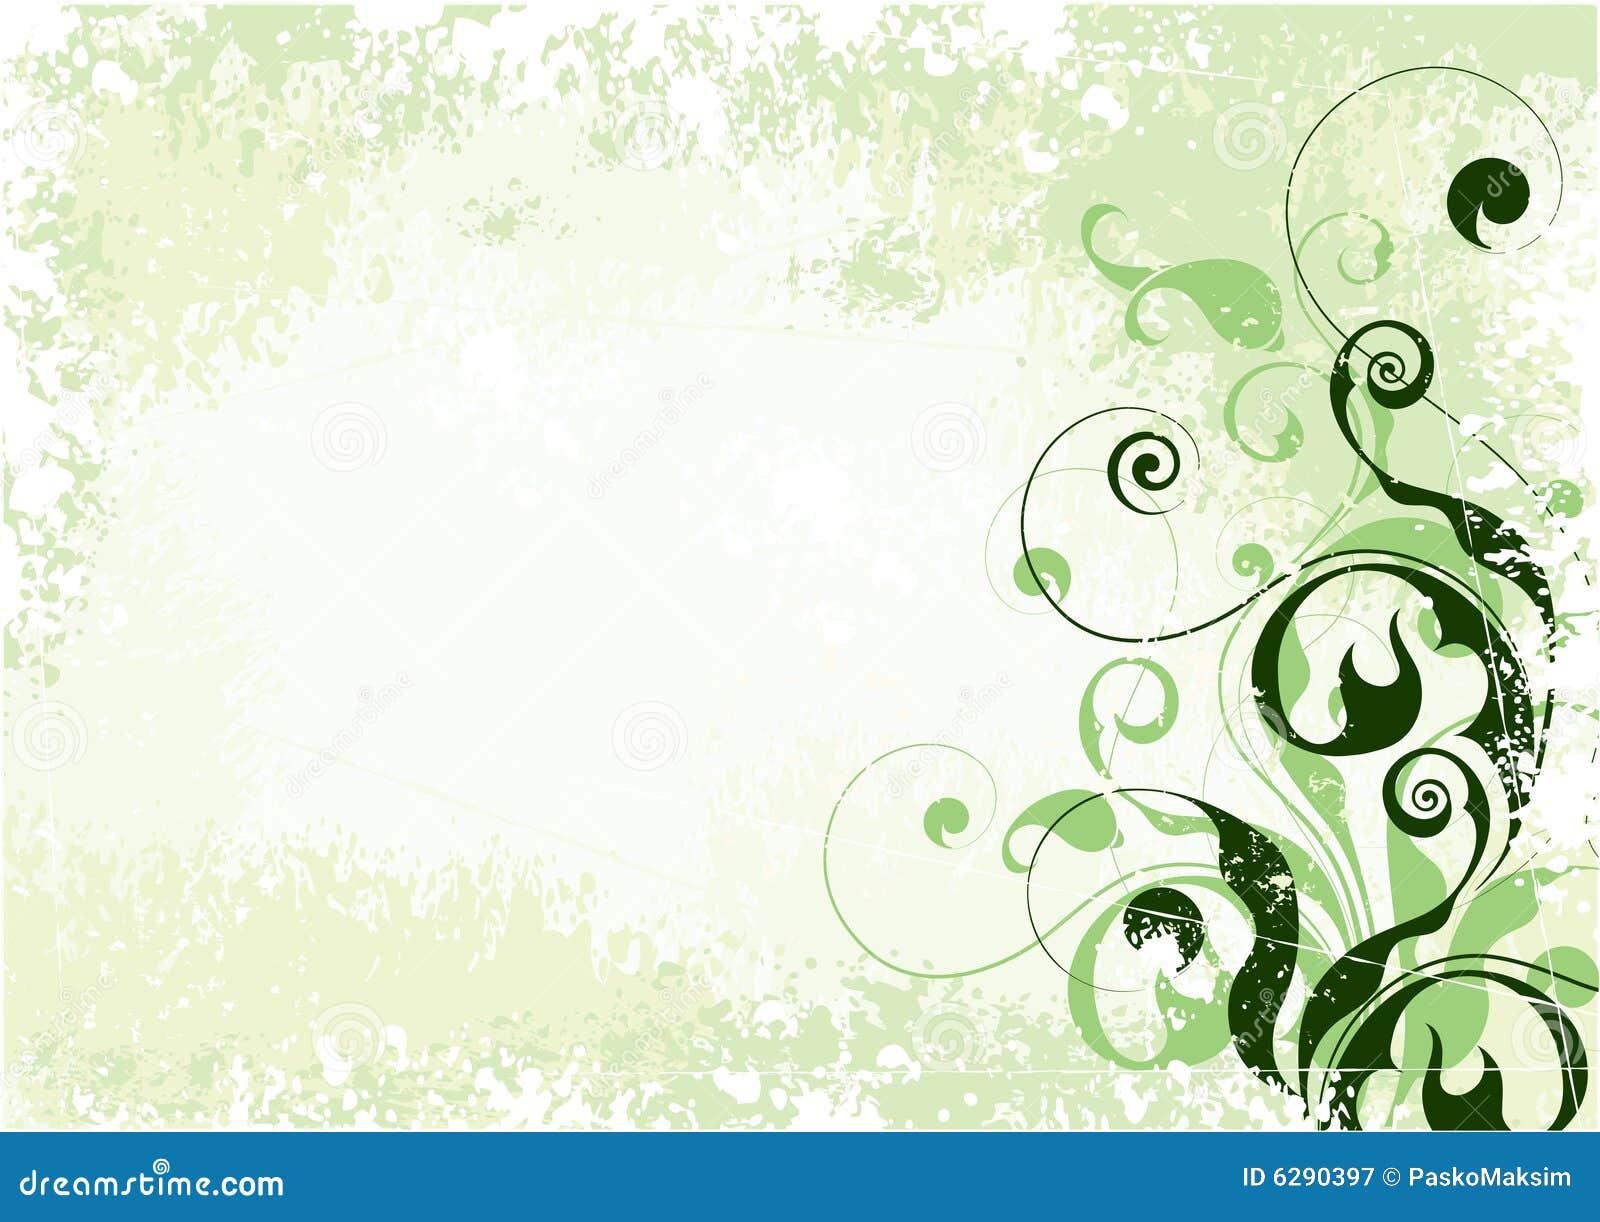 light green flower wallpaper - photo #36